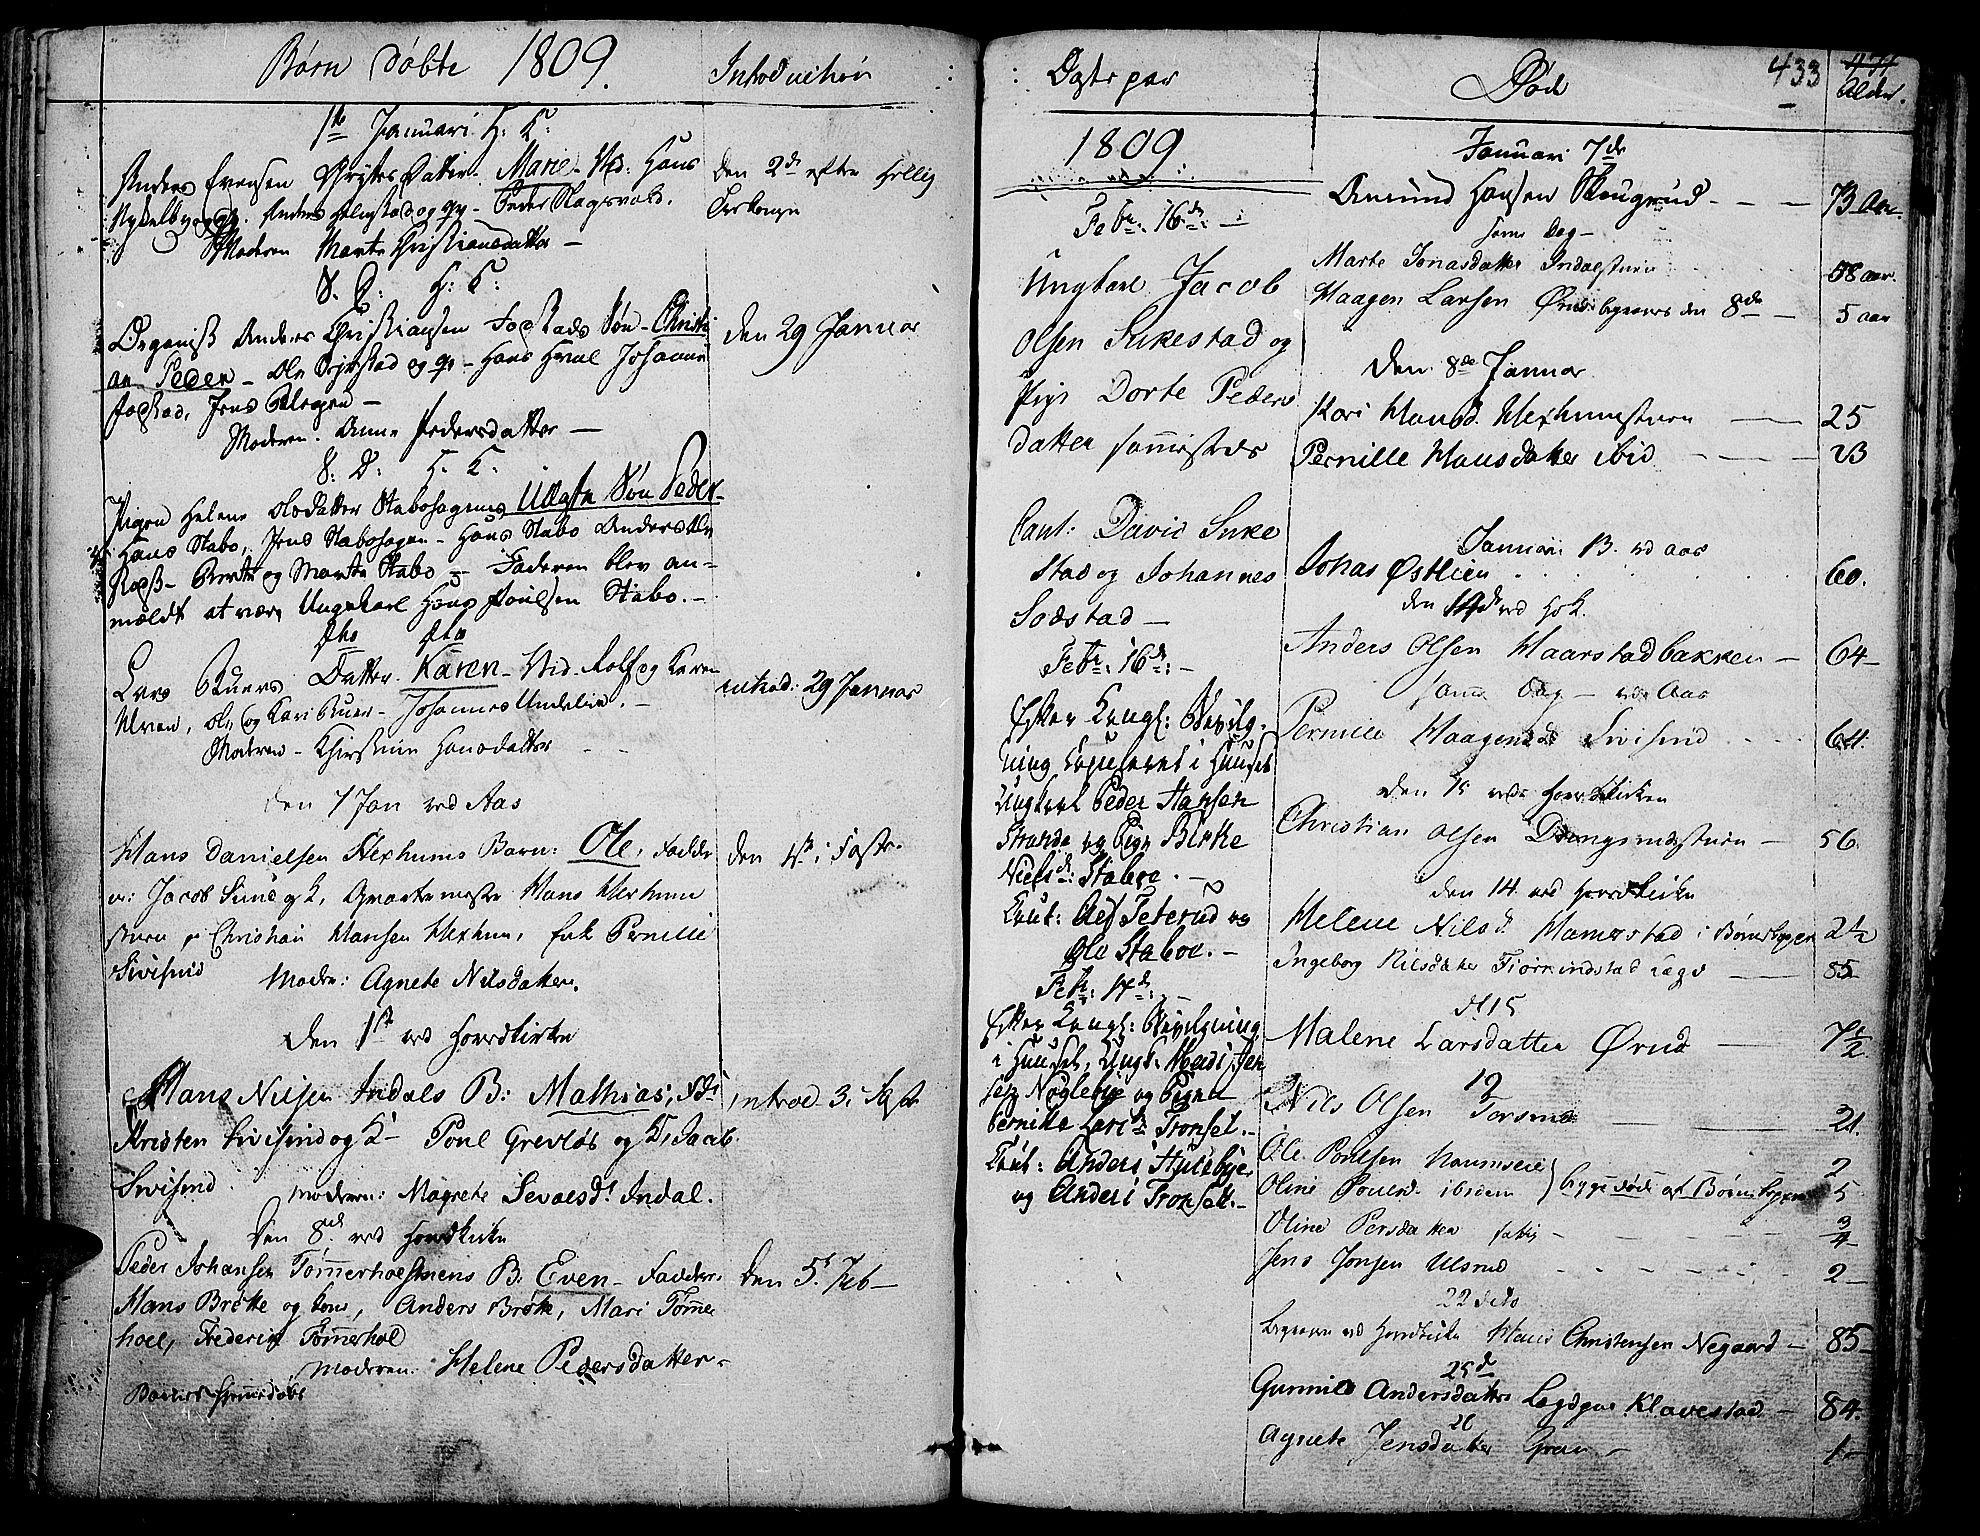 SAH, Toten prestekontor, Ministerialbok nr. 7, 1794-1809, s. 433